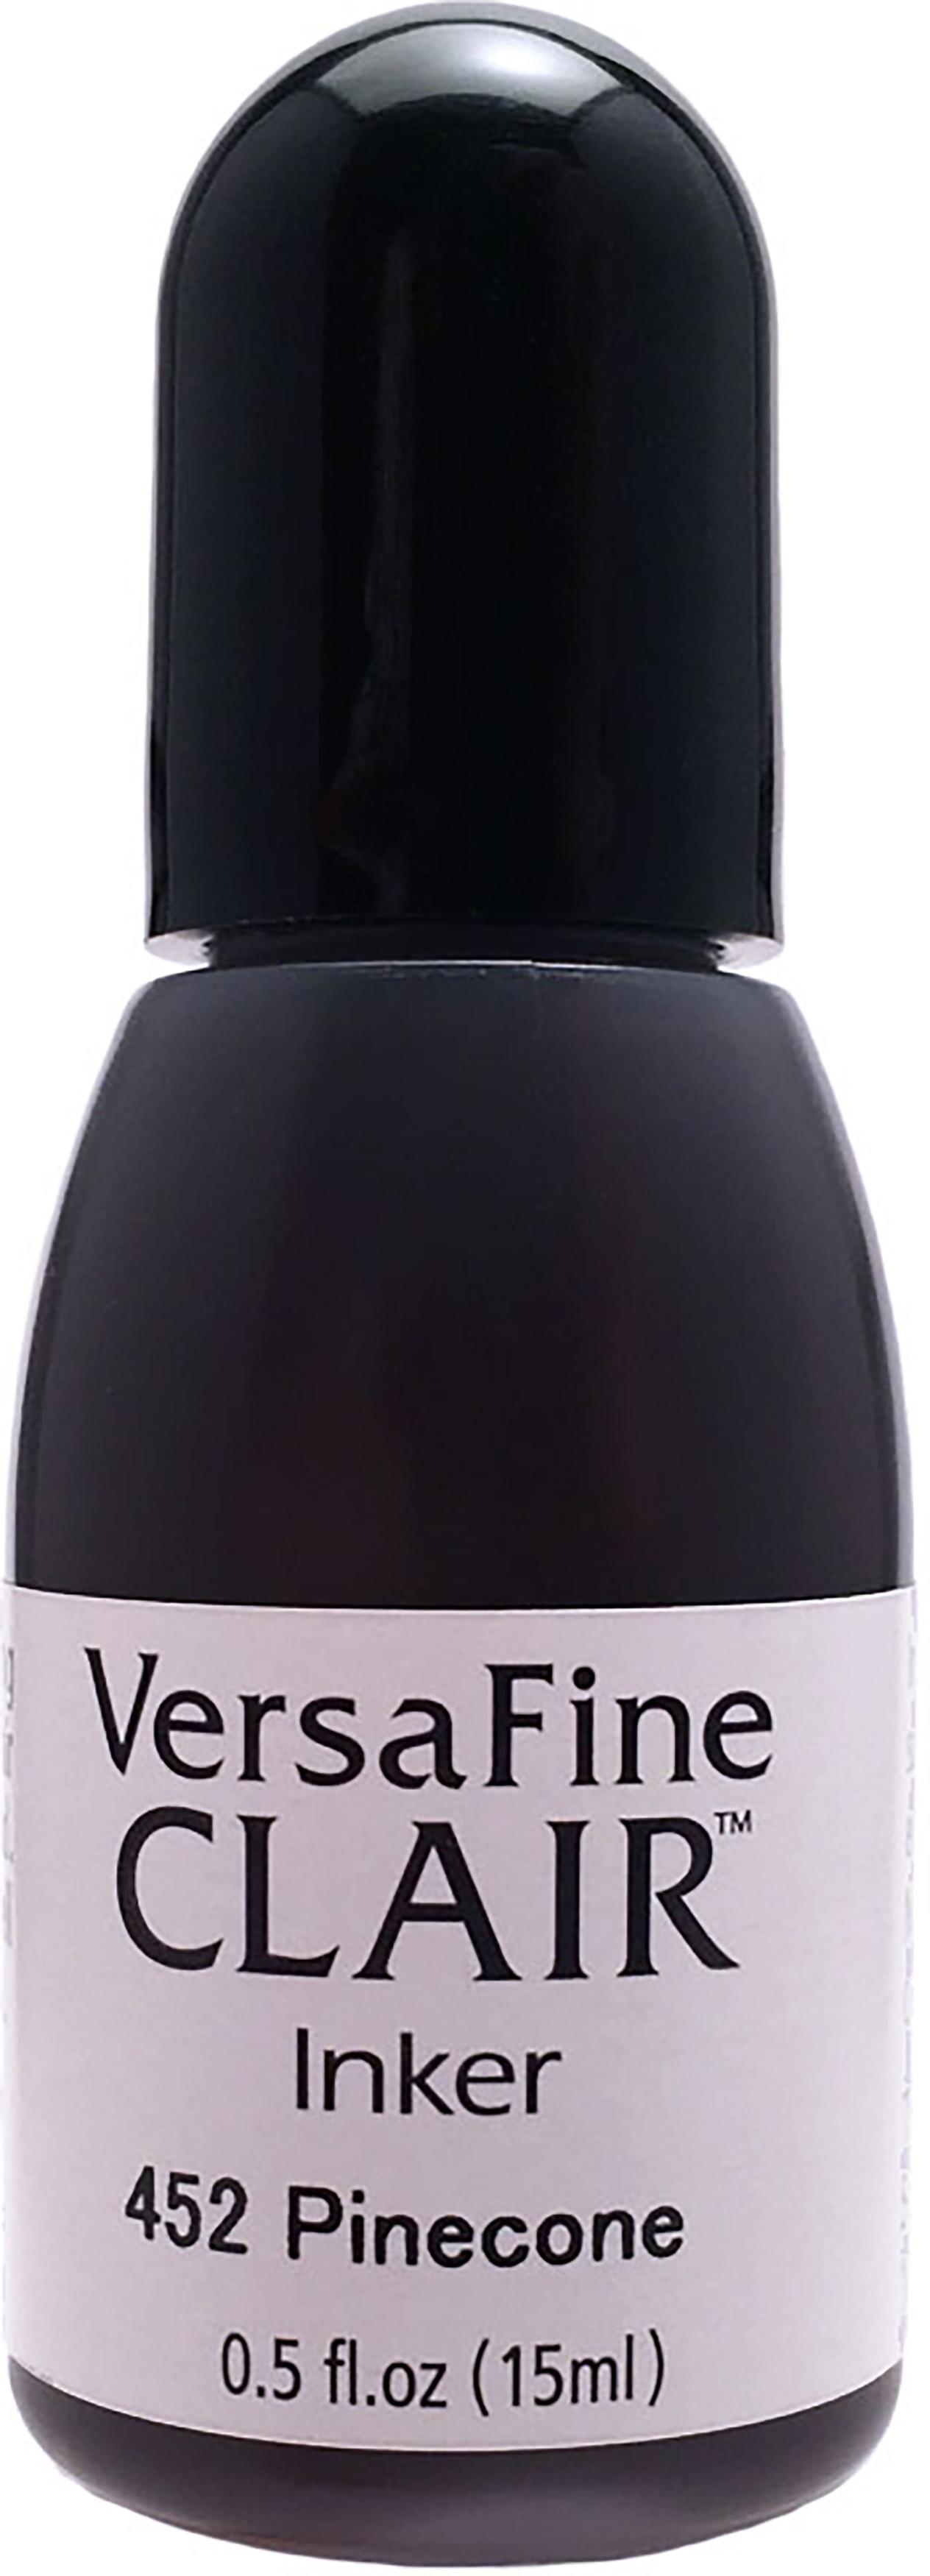 Re-Inker Pinecone VersaFine Clair